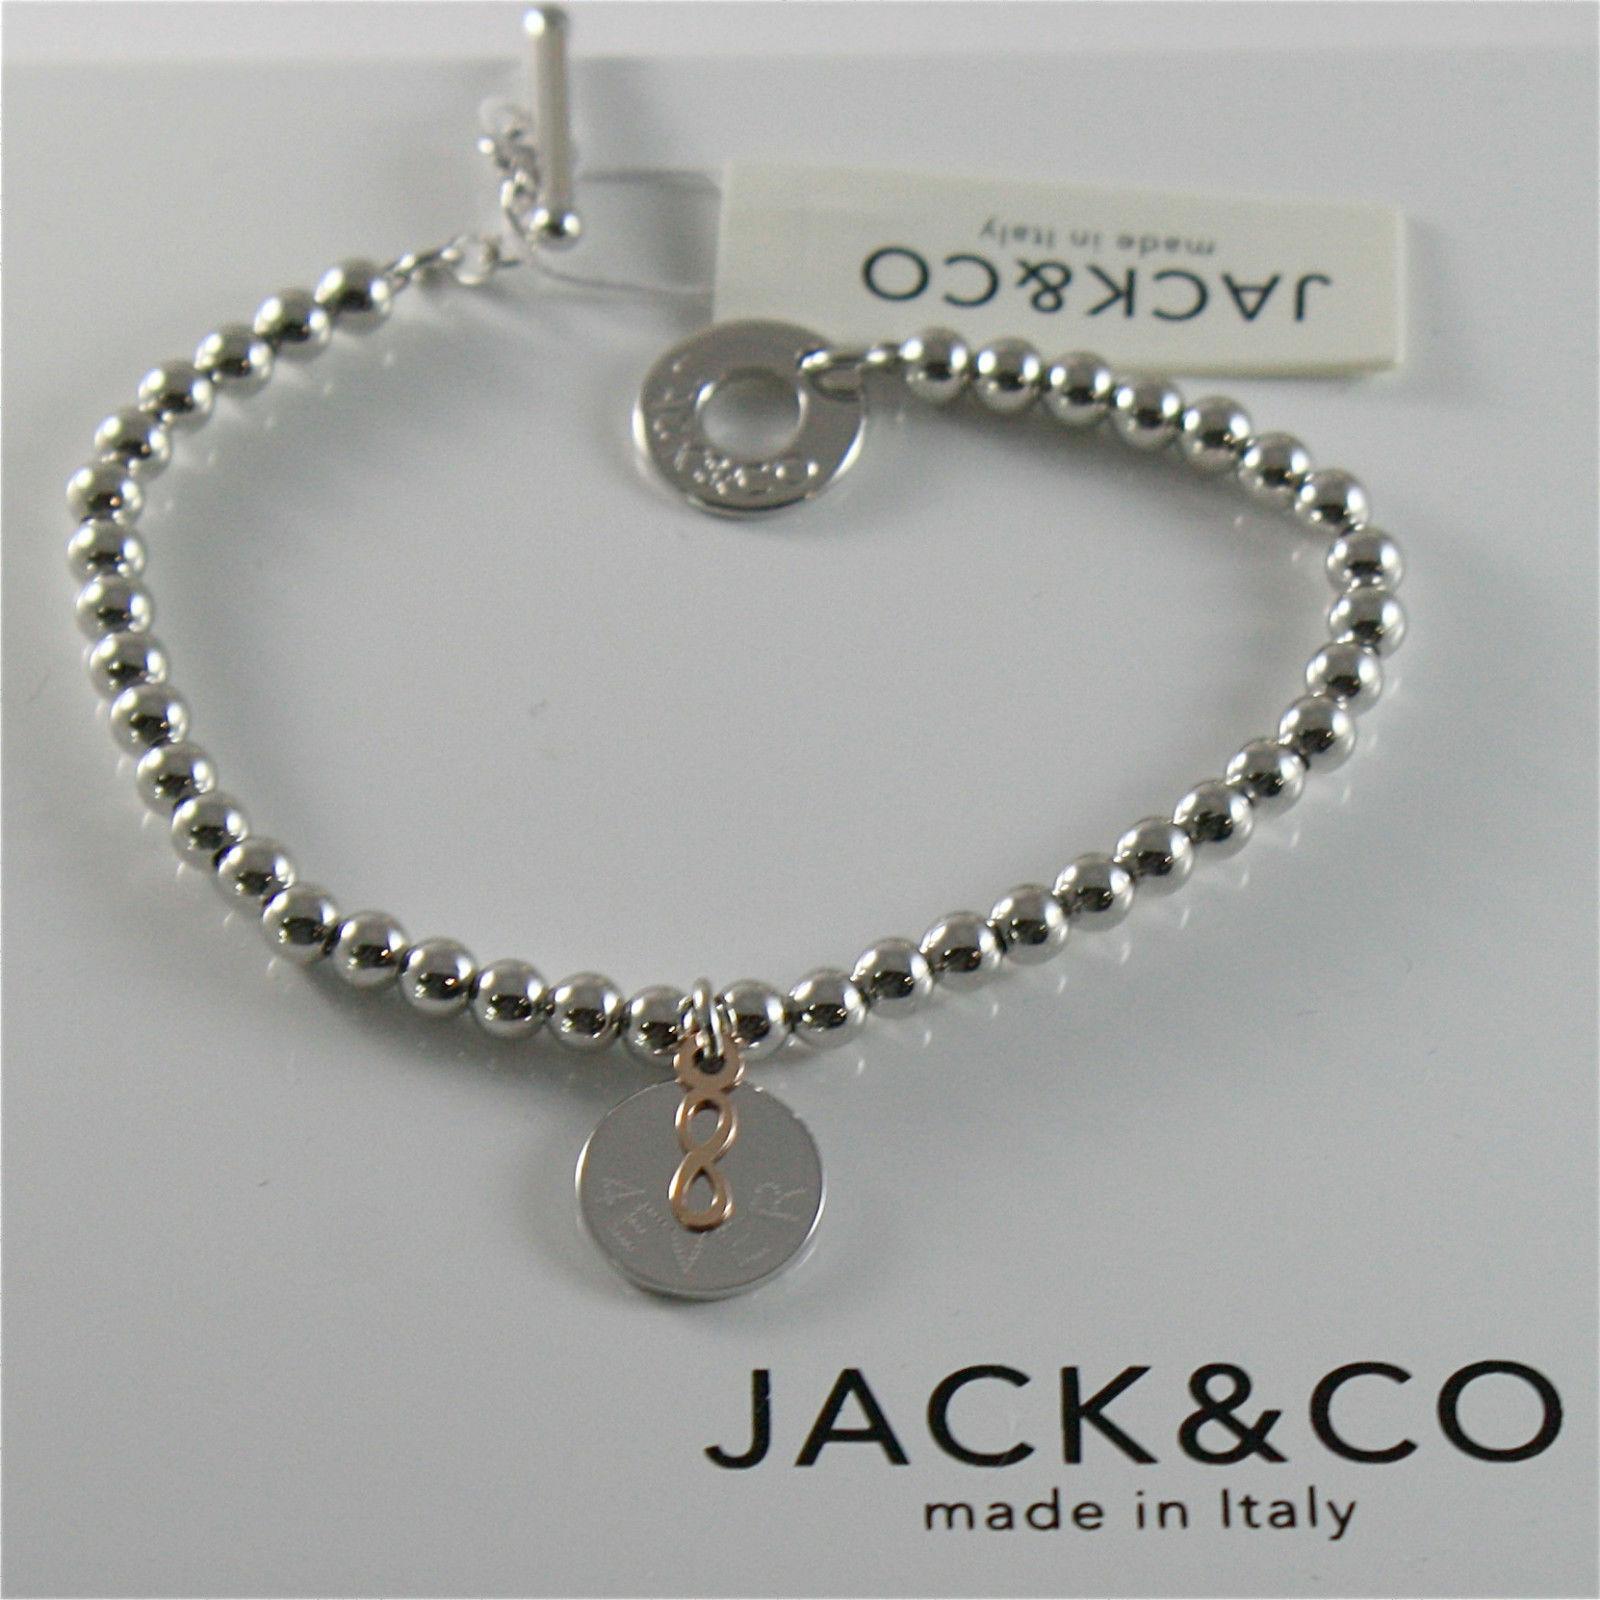 Silver 925 Bracelet Jack&co with Balls Shiny Gold round Pendant & Pink 9 KT